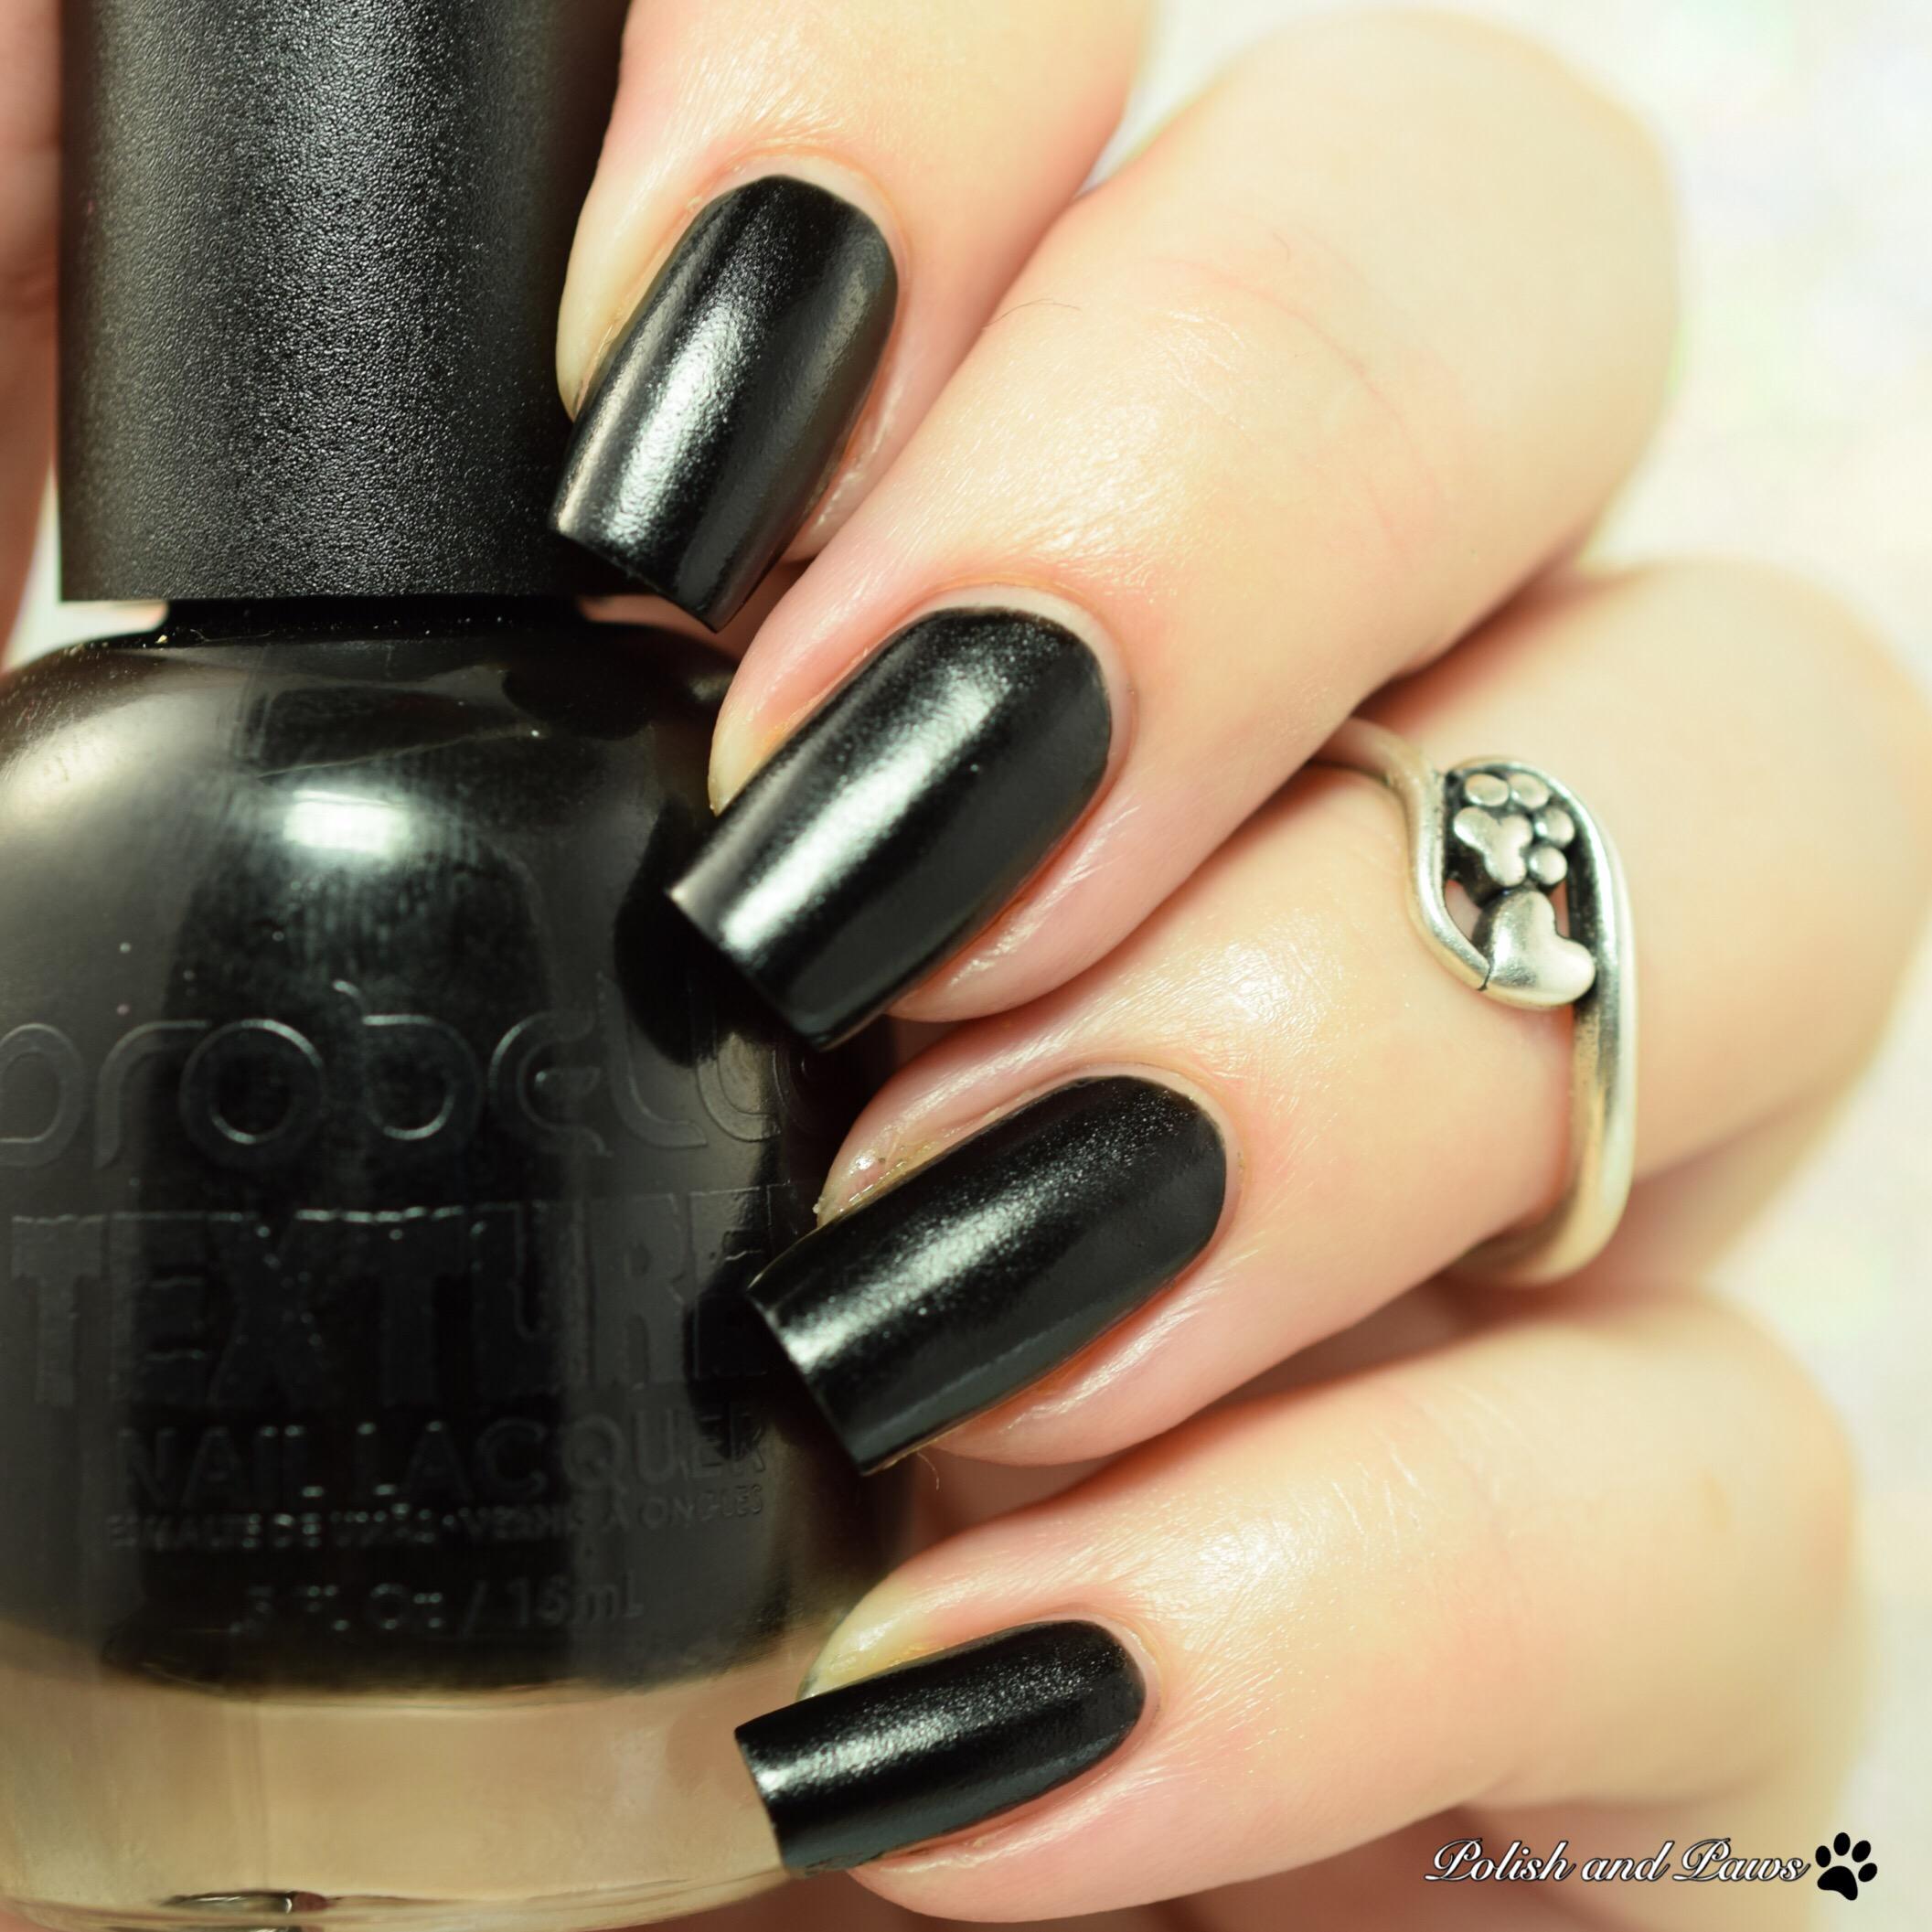 Probelle Textured Black